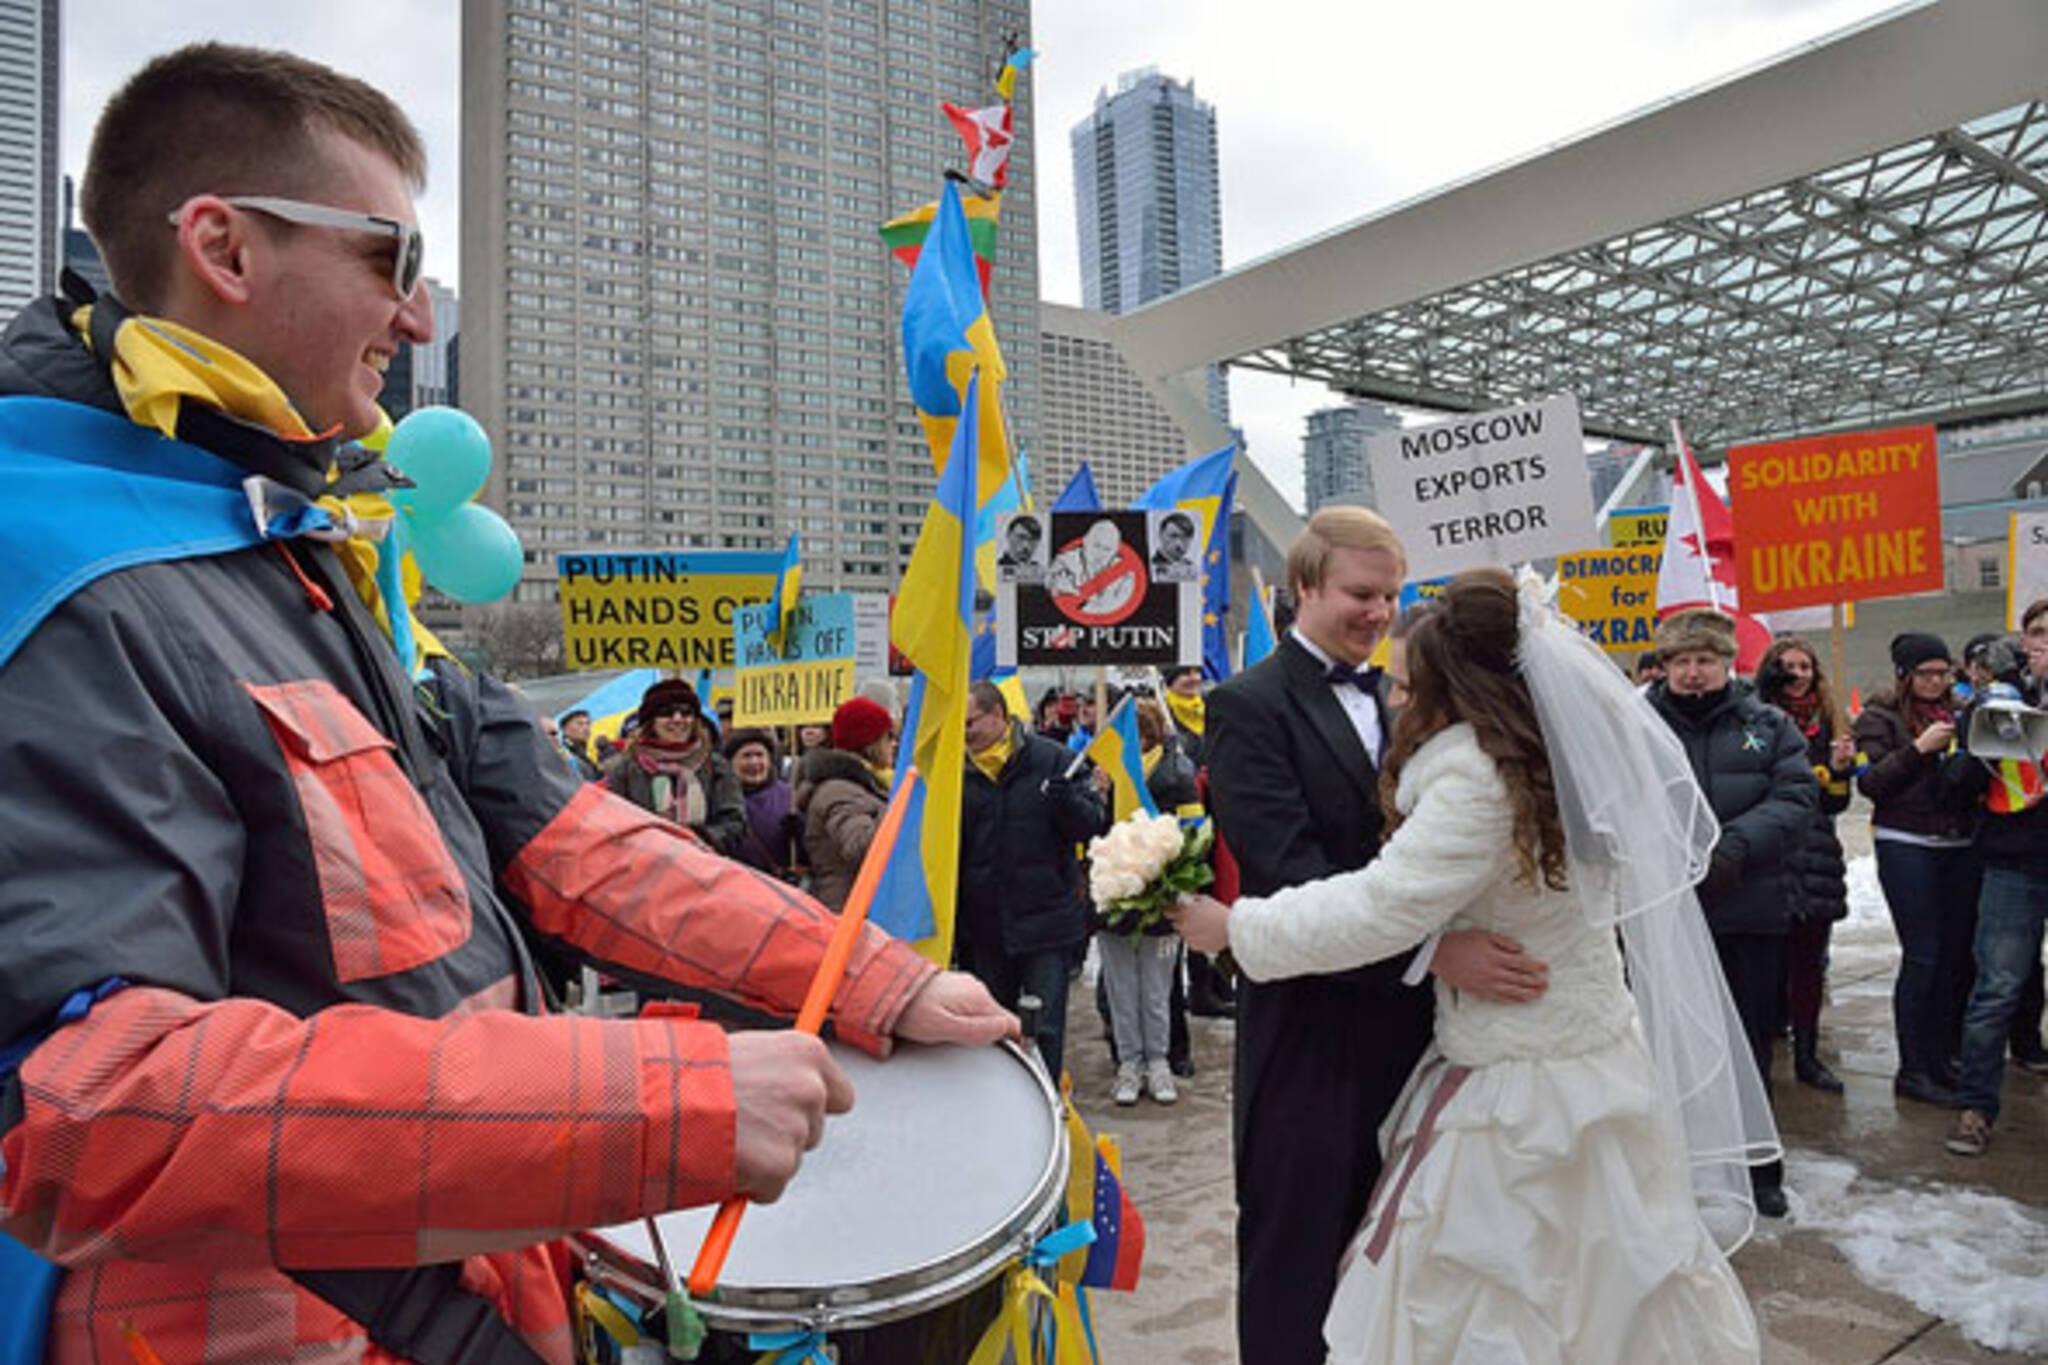 Ukrainians demonstration